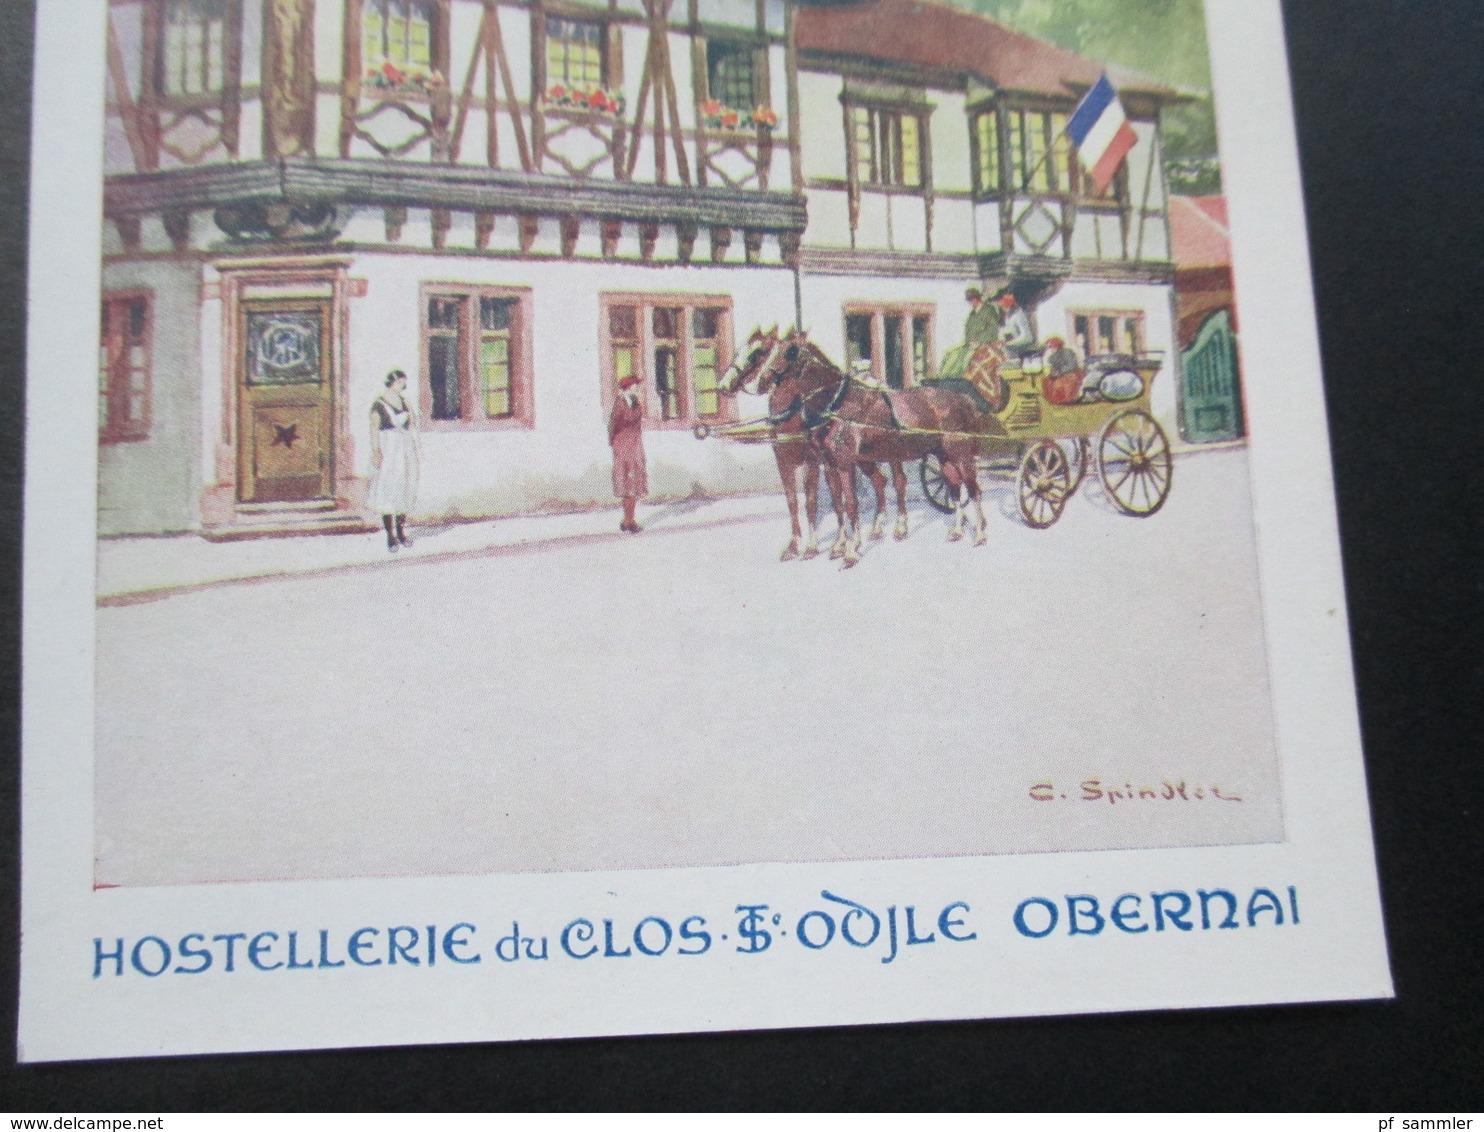 AK Künstlerkarte Hostellerie Du Clos Ste Odile Obernai. Pferdekutsche. Imp. Camis Paris - Hotels & Gaststätten